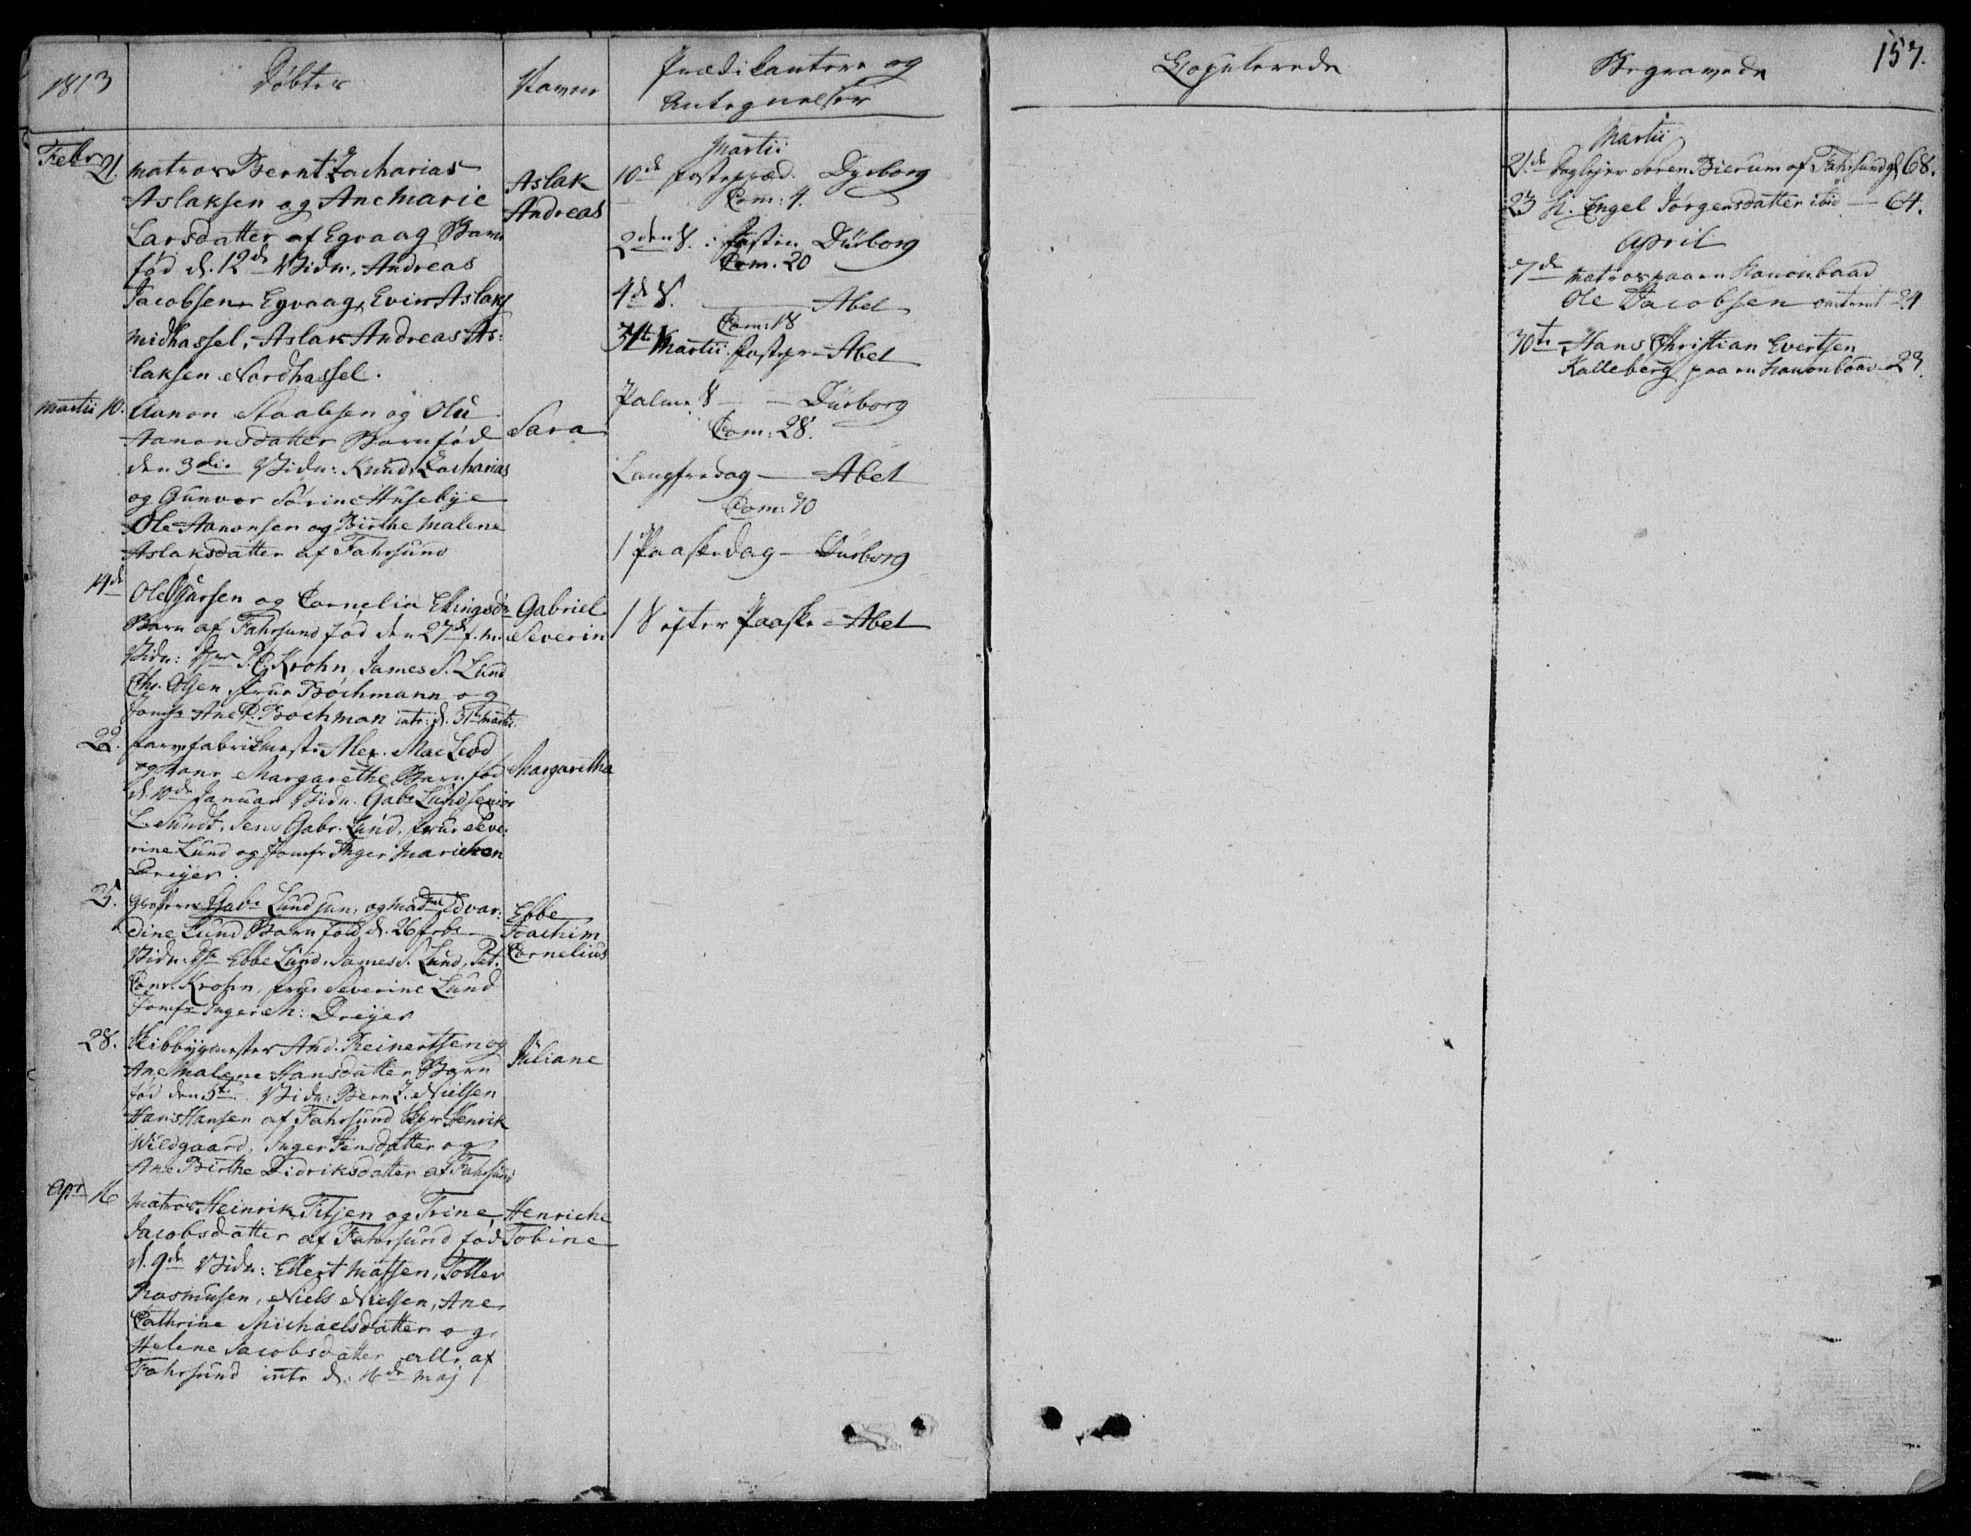 SAK, Farsund sokneprestkontor, F/Fa/L0001: Ministerialbok nr. A 1, 1784-1815, s. 157